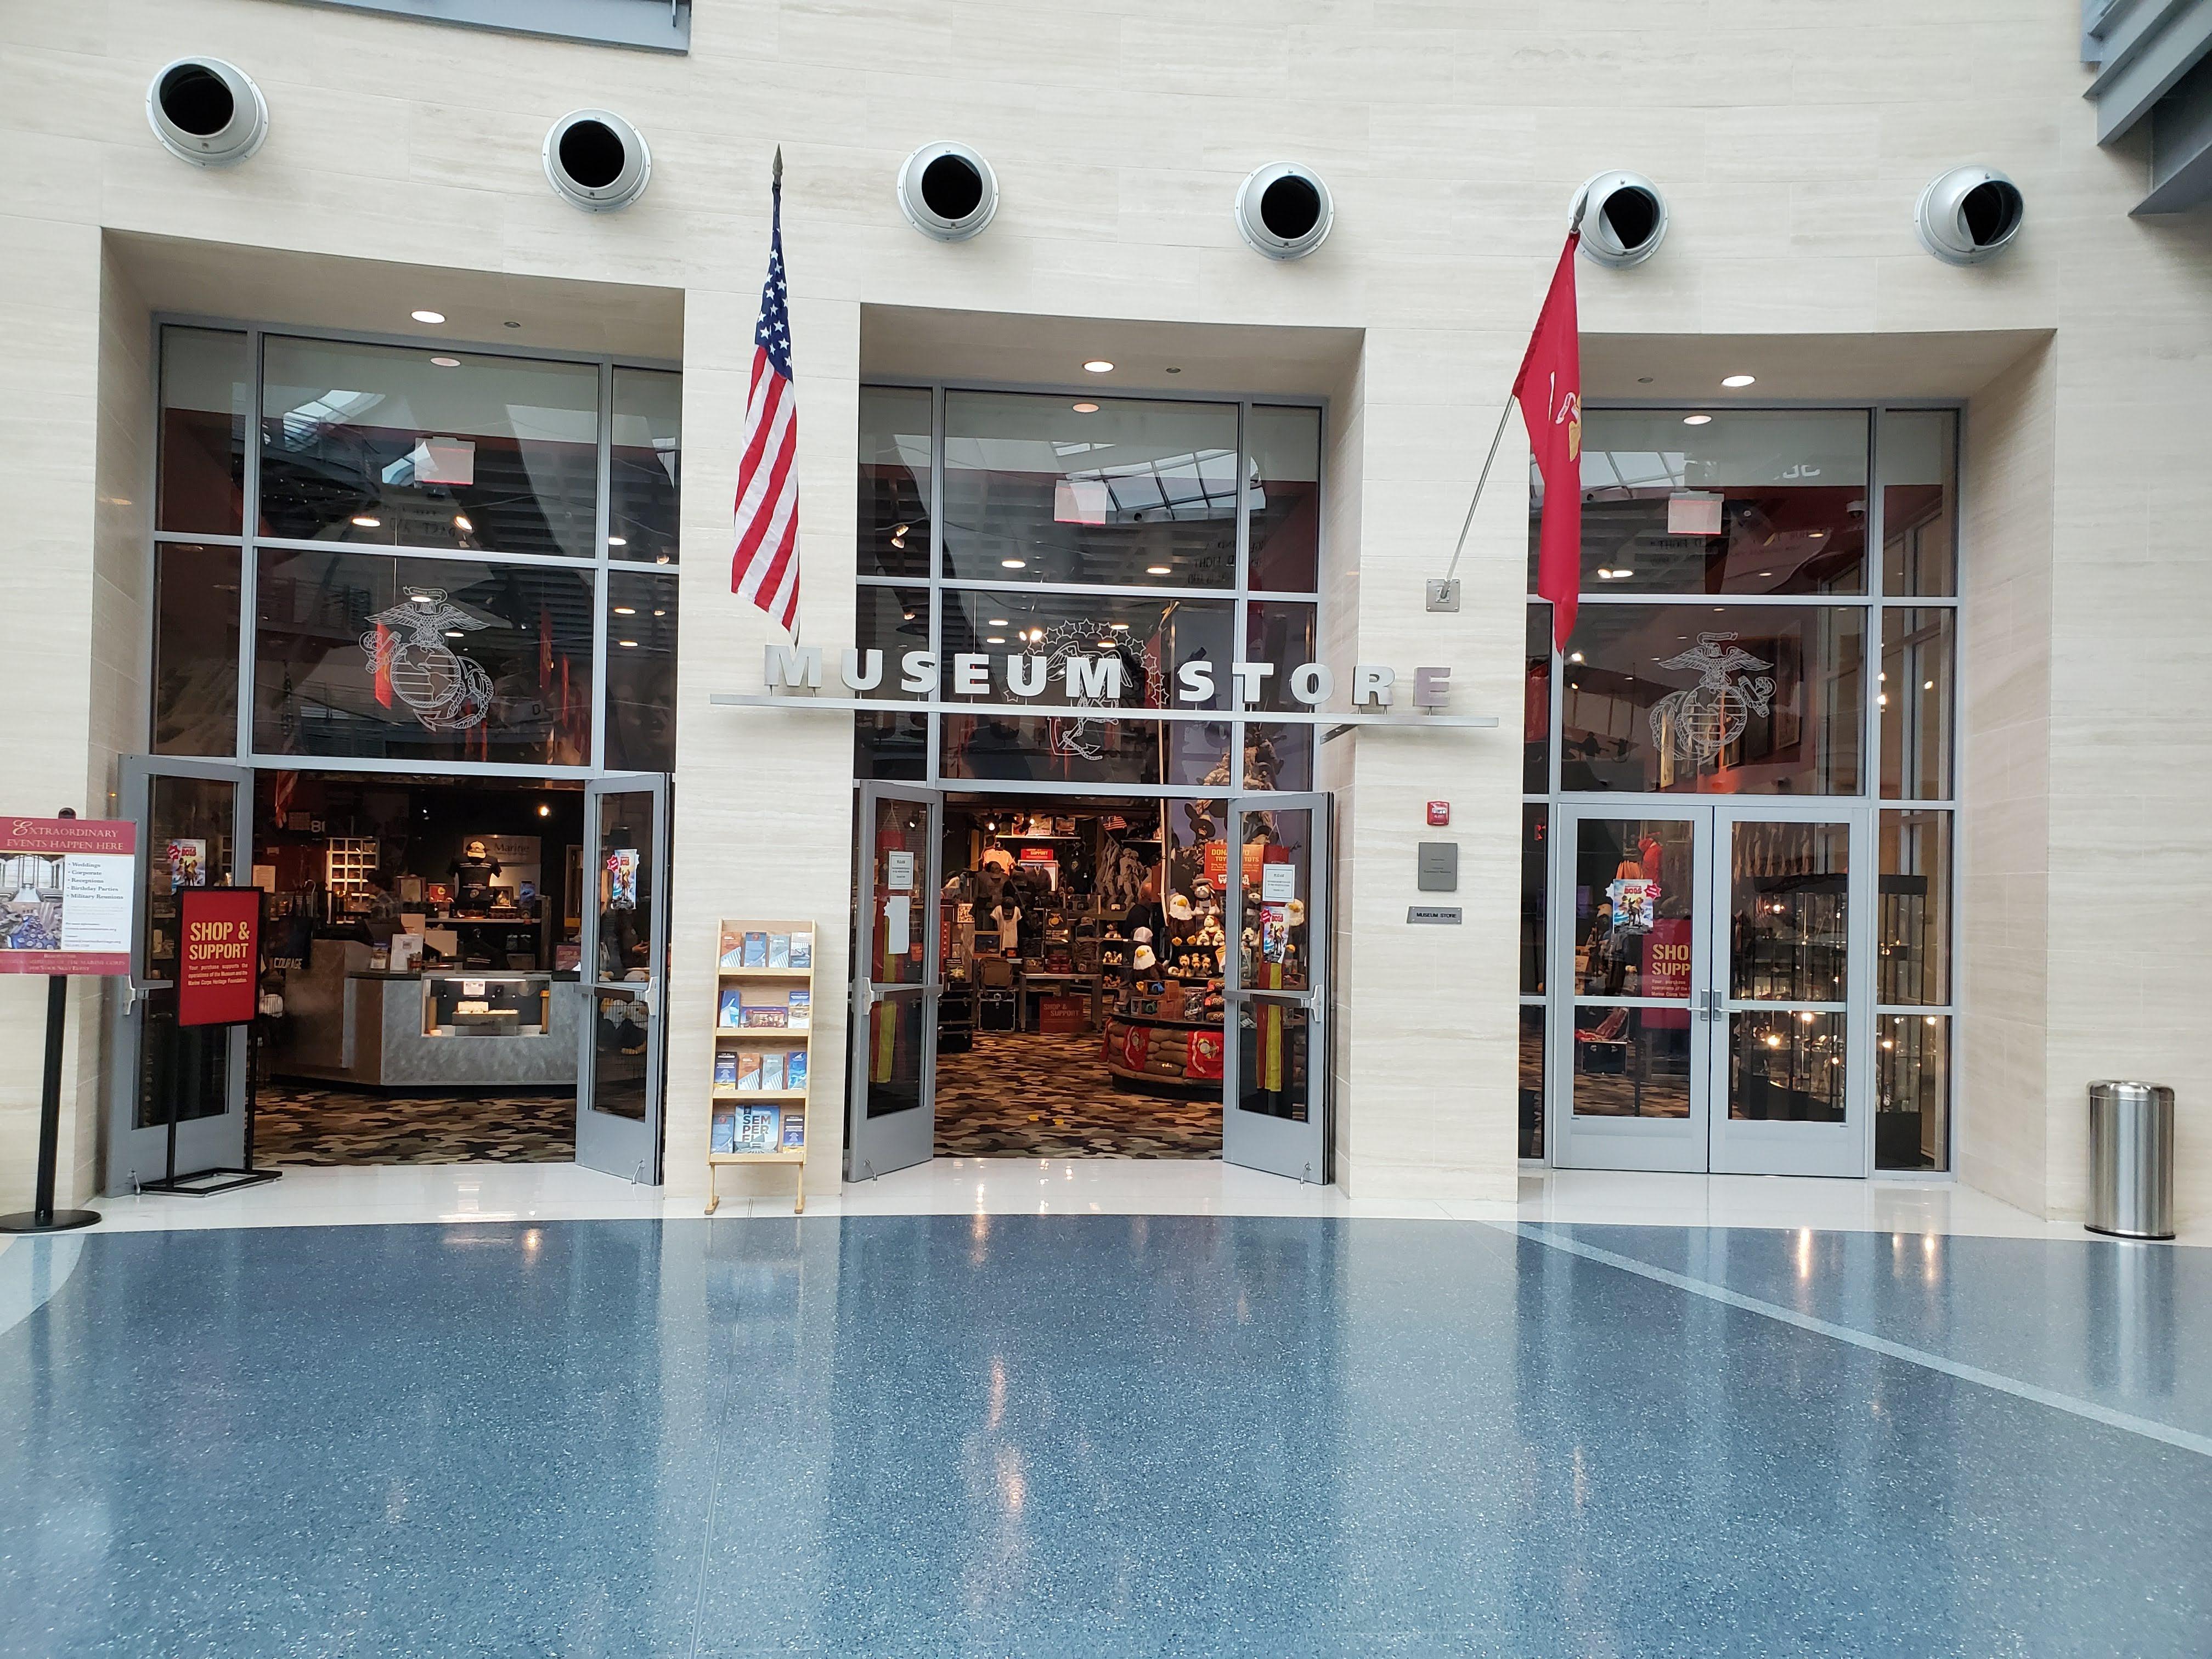 USMC, National Museum of the Marine Corps, United States Marines, Devil Dogs, Leathernecks, Jarheads, Quantico VA, Museum Store, Ooh Rah,